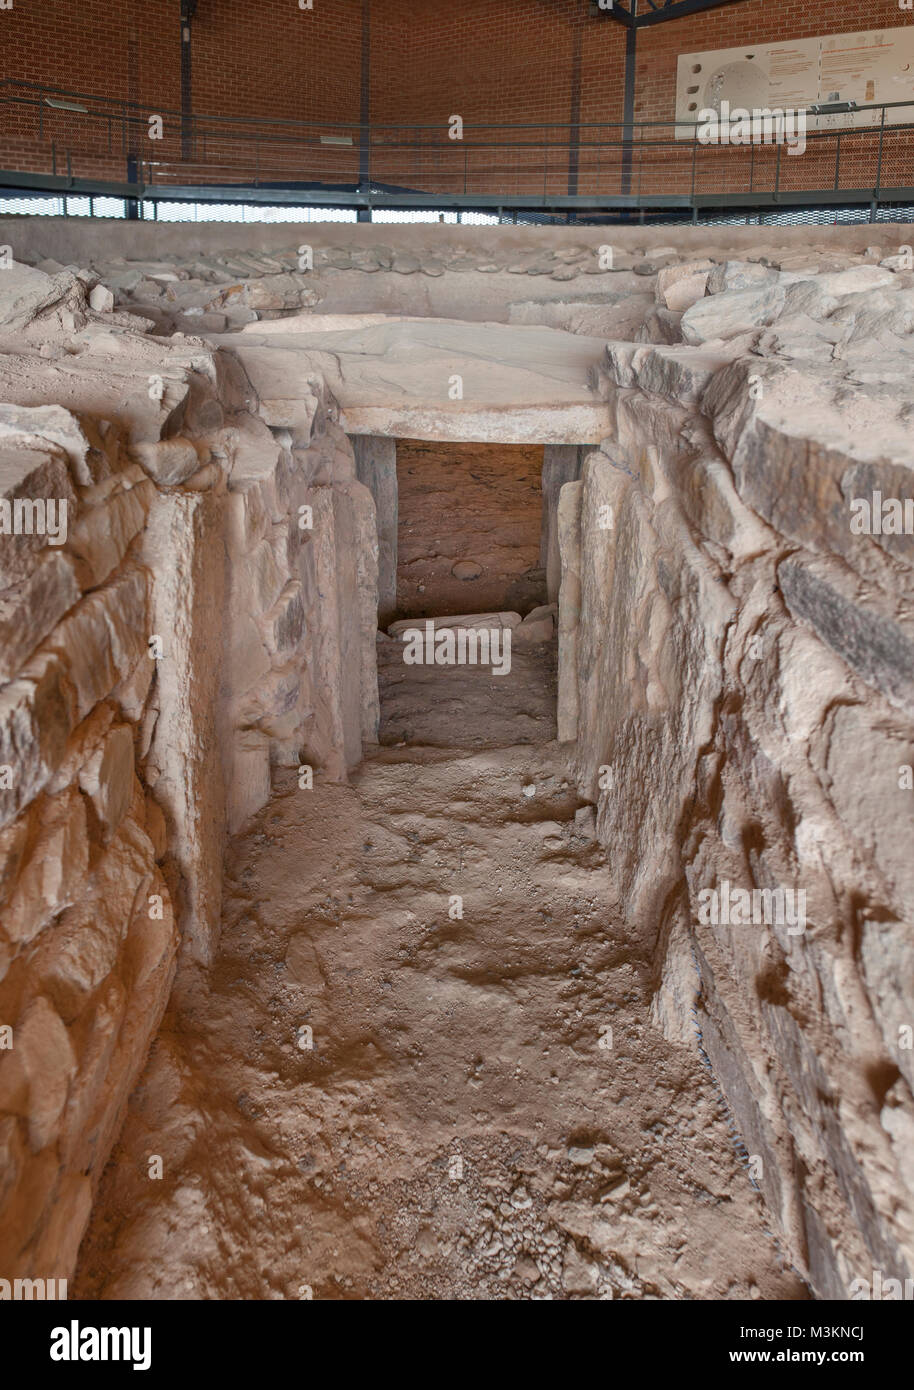 Archeological site of Huerta Montero, singular Tholos Dolmen,  Almendralejo, Spain. Main entrance and visitors centre - Stock Image